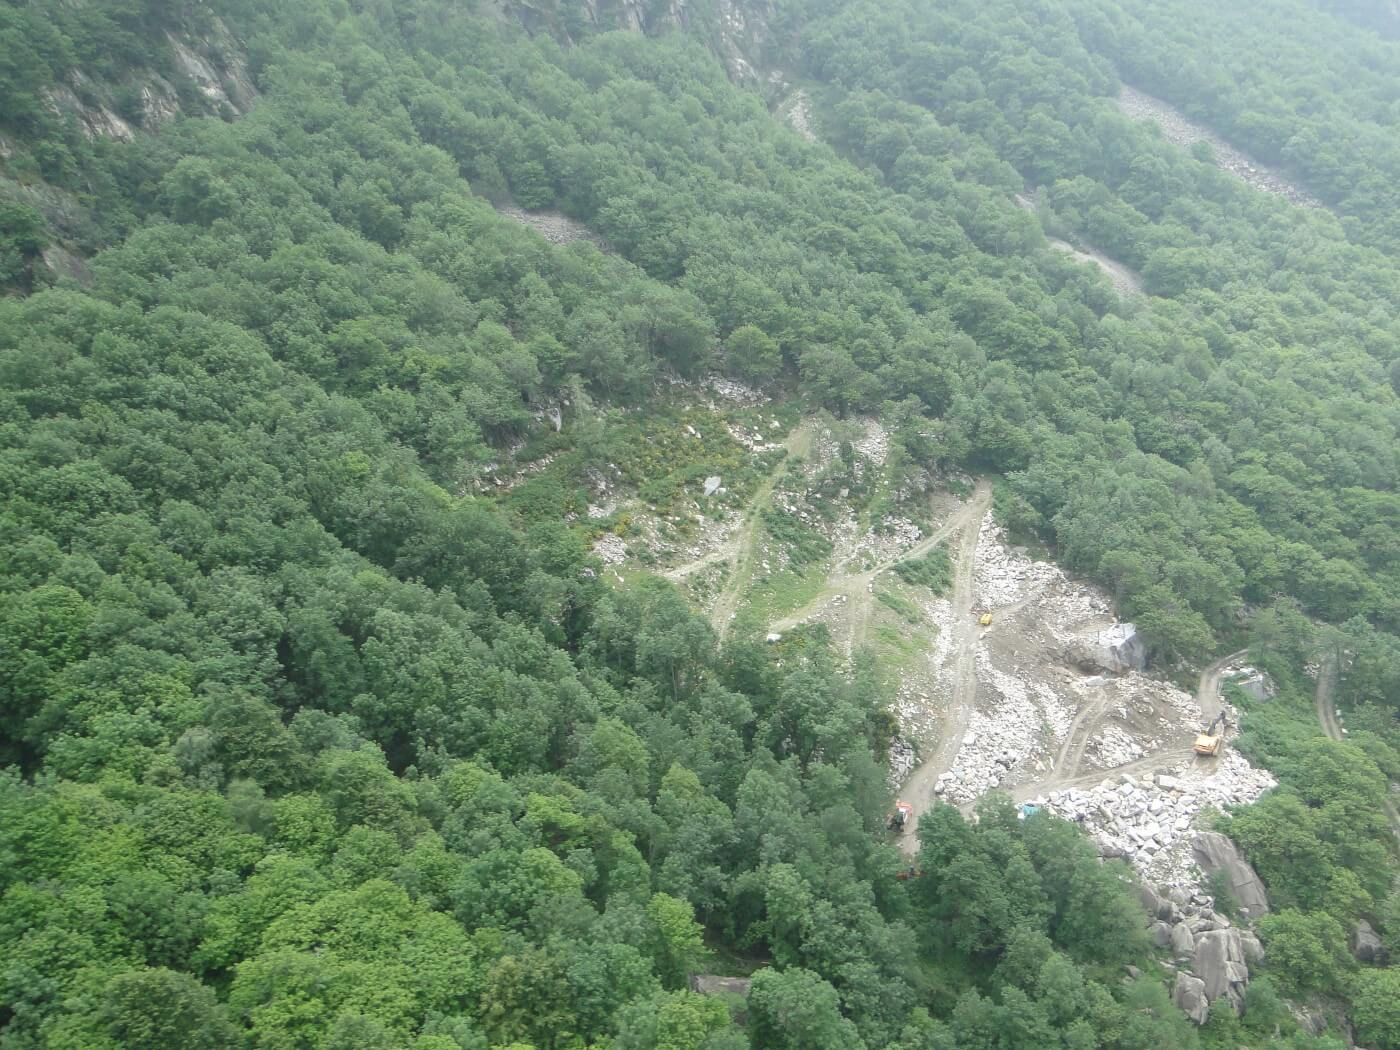 Geologia ambientale a Prata Camportaccio